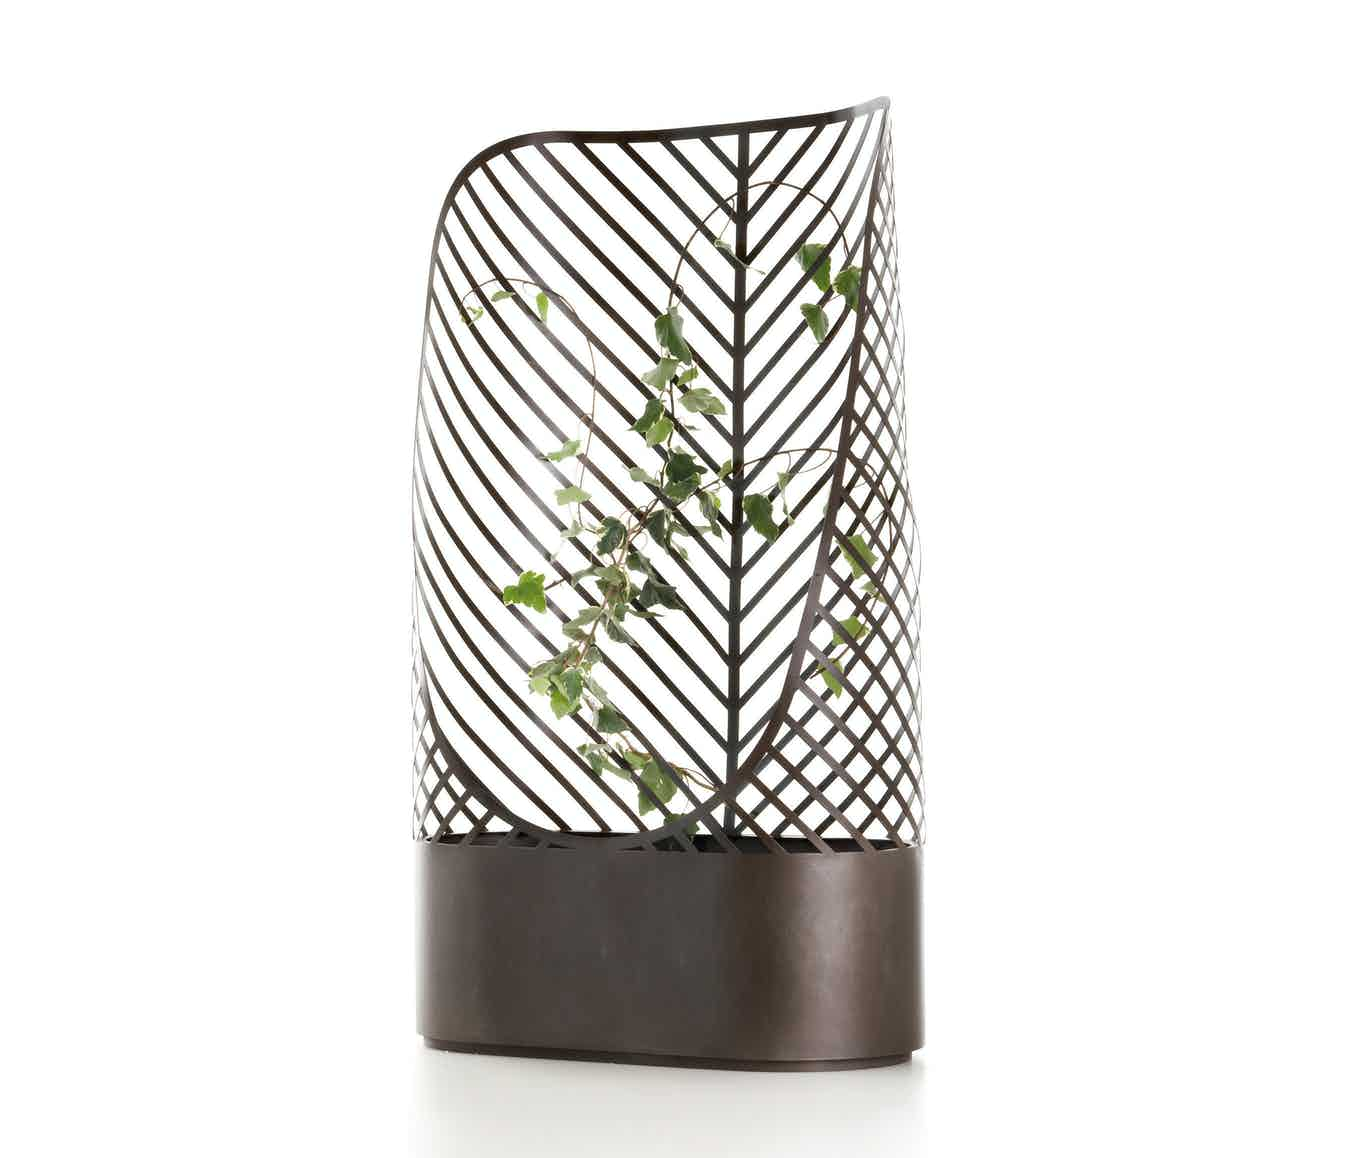 De Castelli Screen Pot Stainless Steel Haute Living